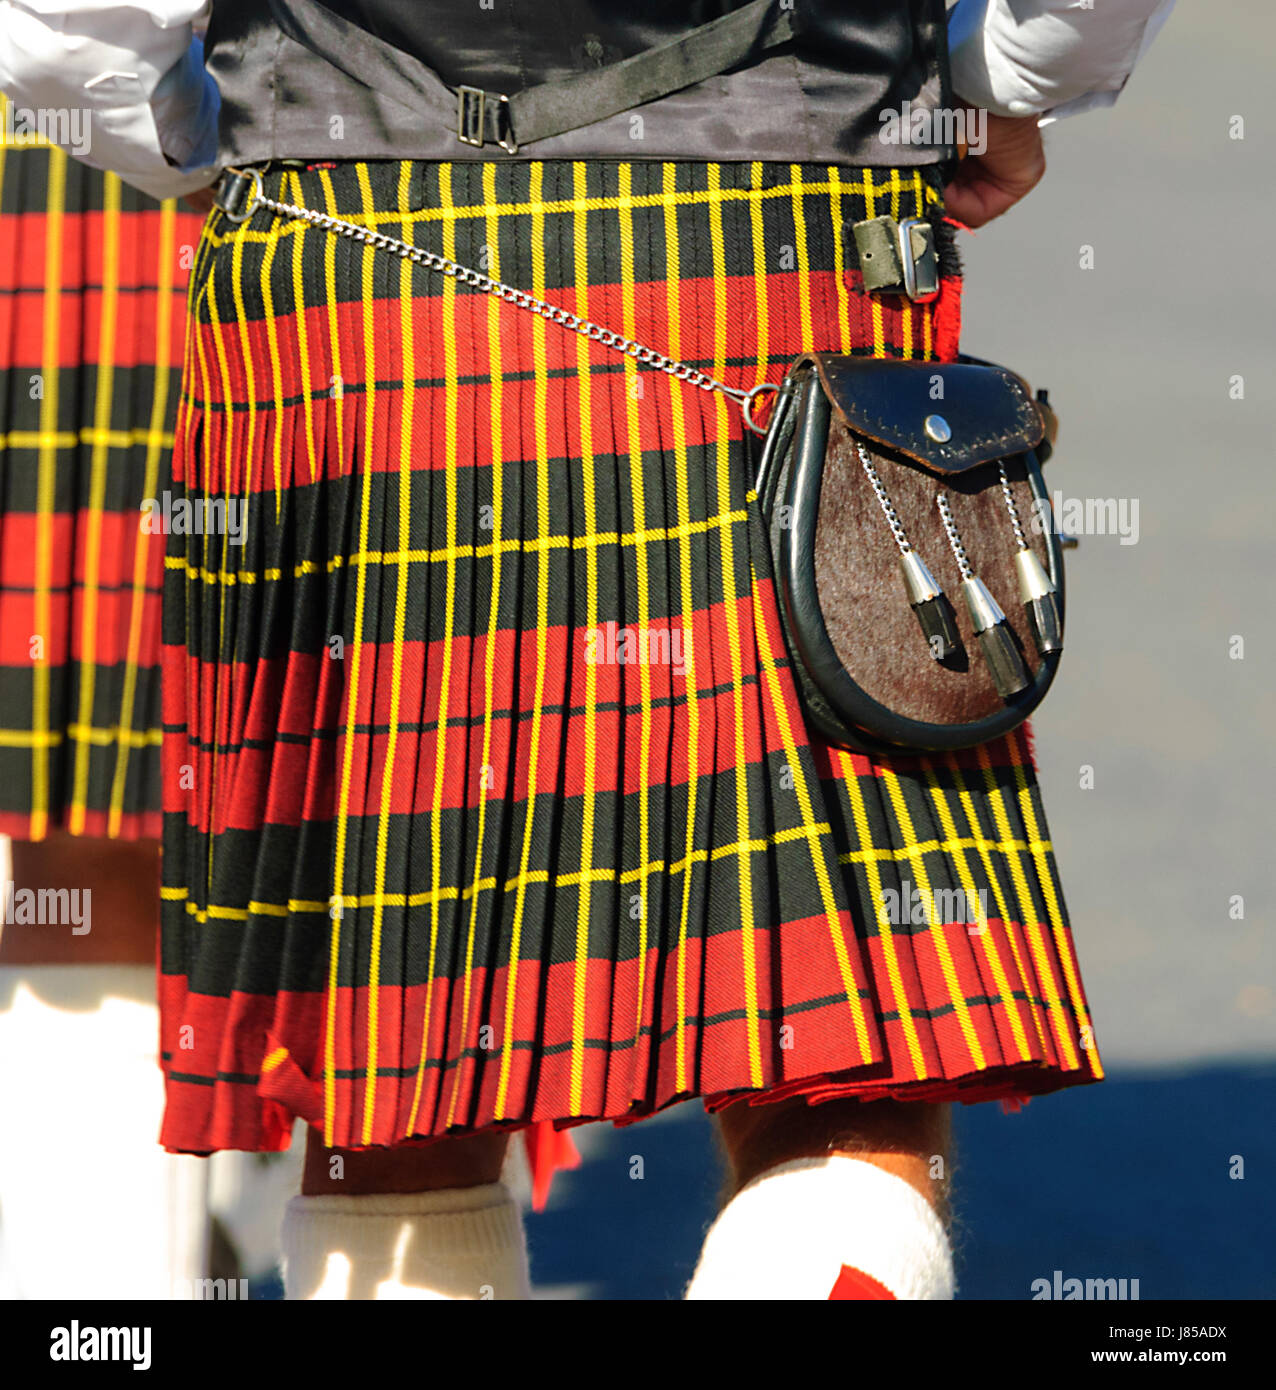 Scottish kilt and Sporran - Stock Image